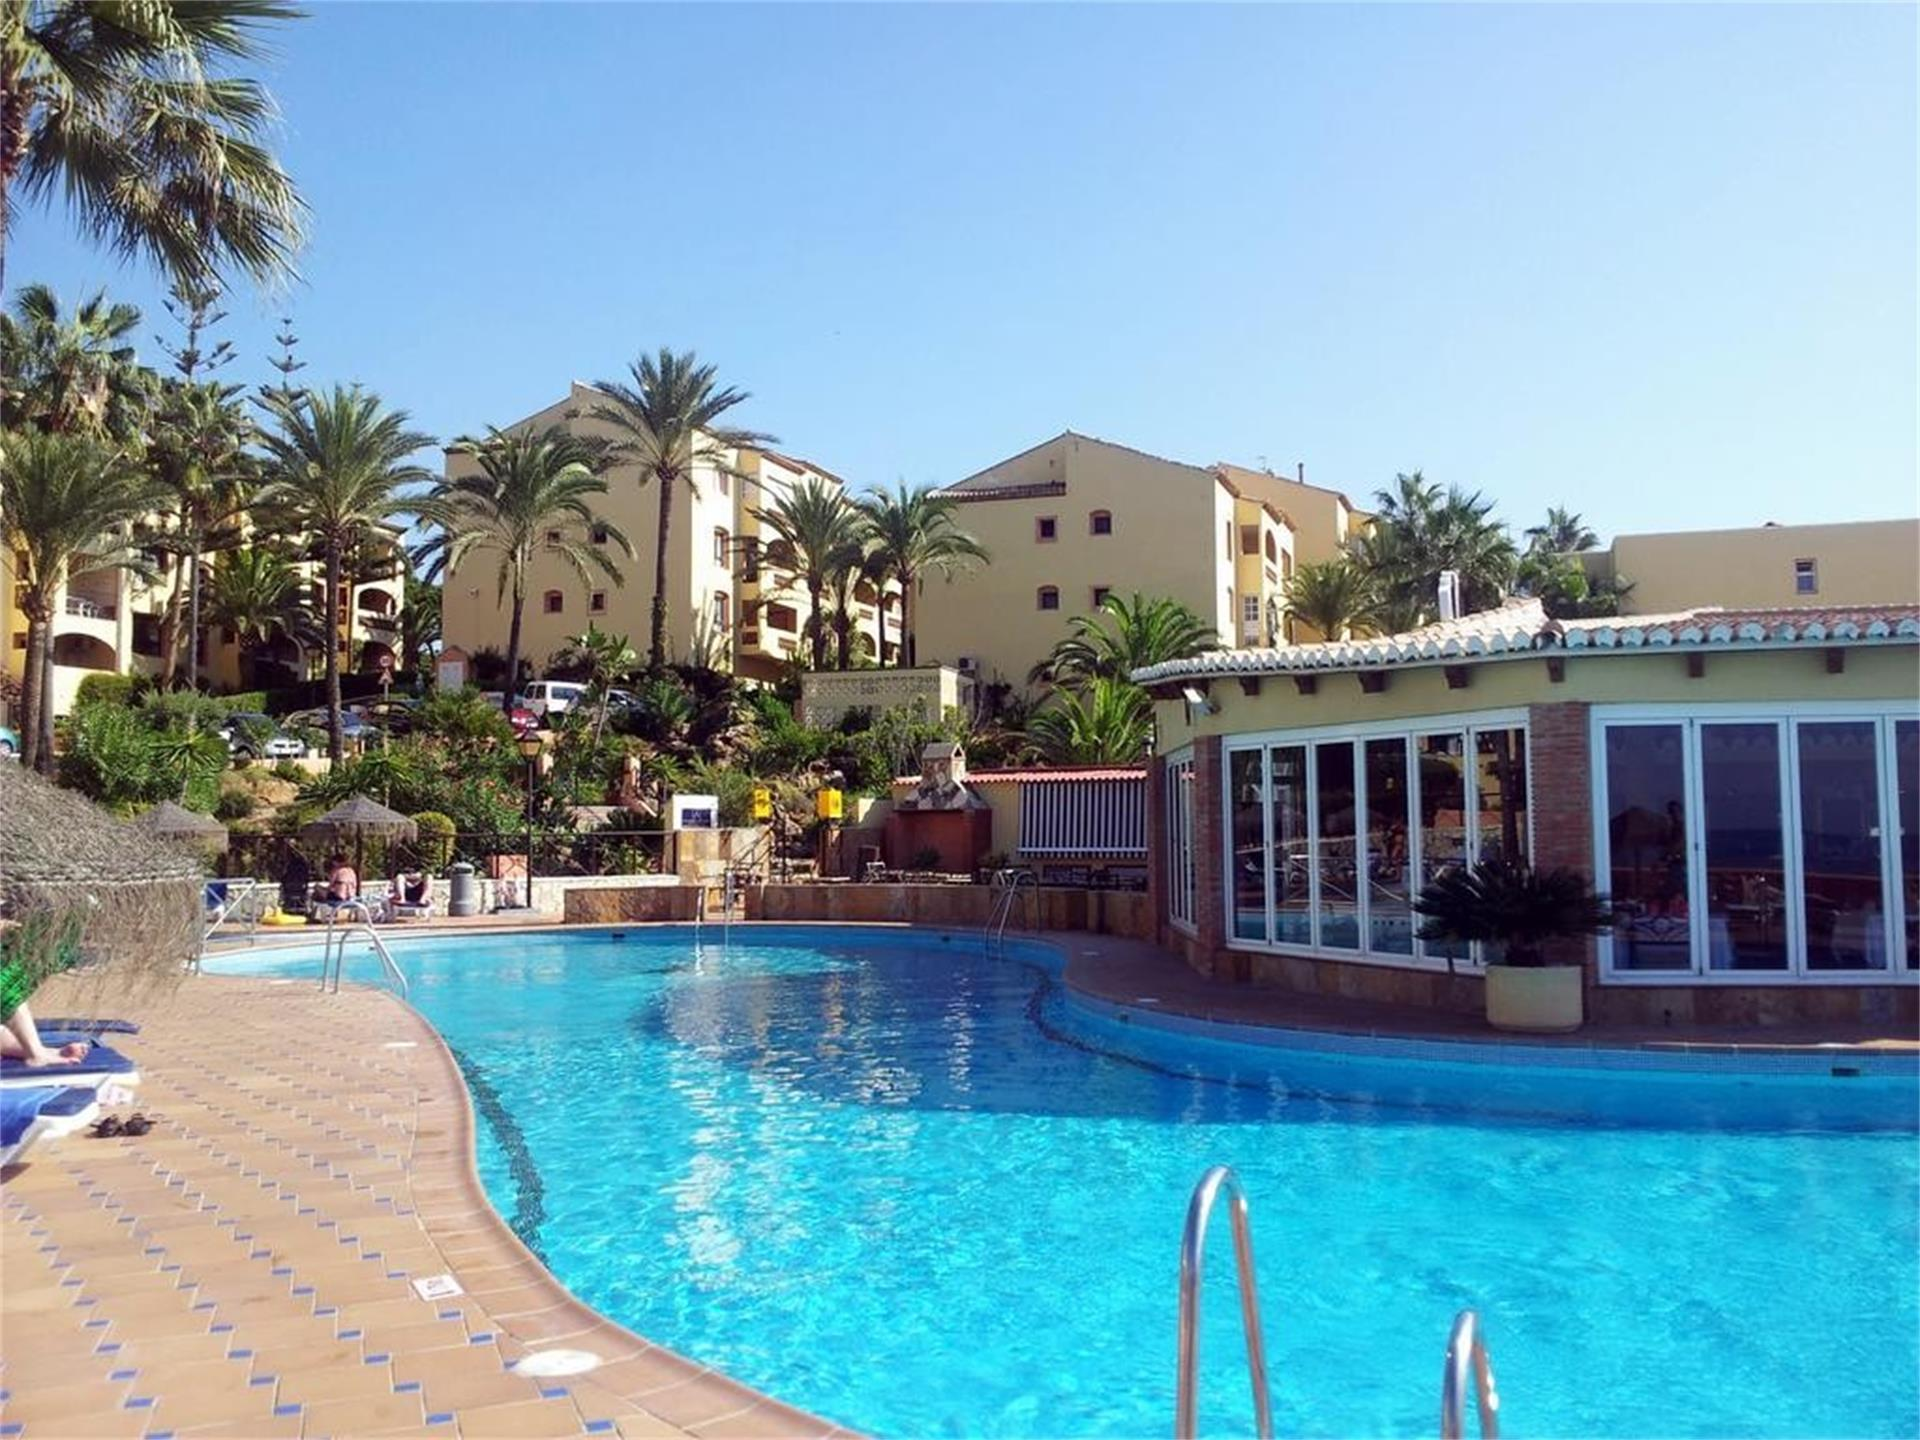 Apartamento de alquiler en Urbanizacion Dona Lola Calahonda (Mijas, Málaga)